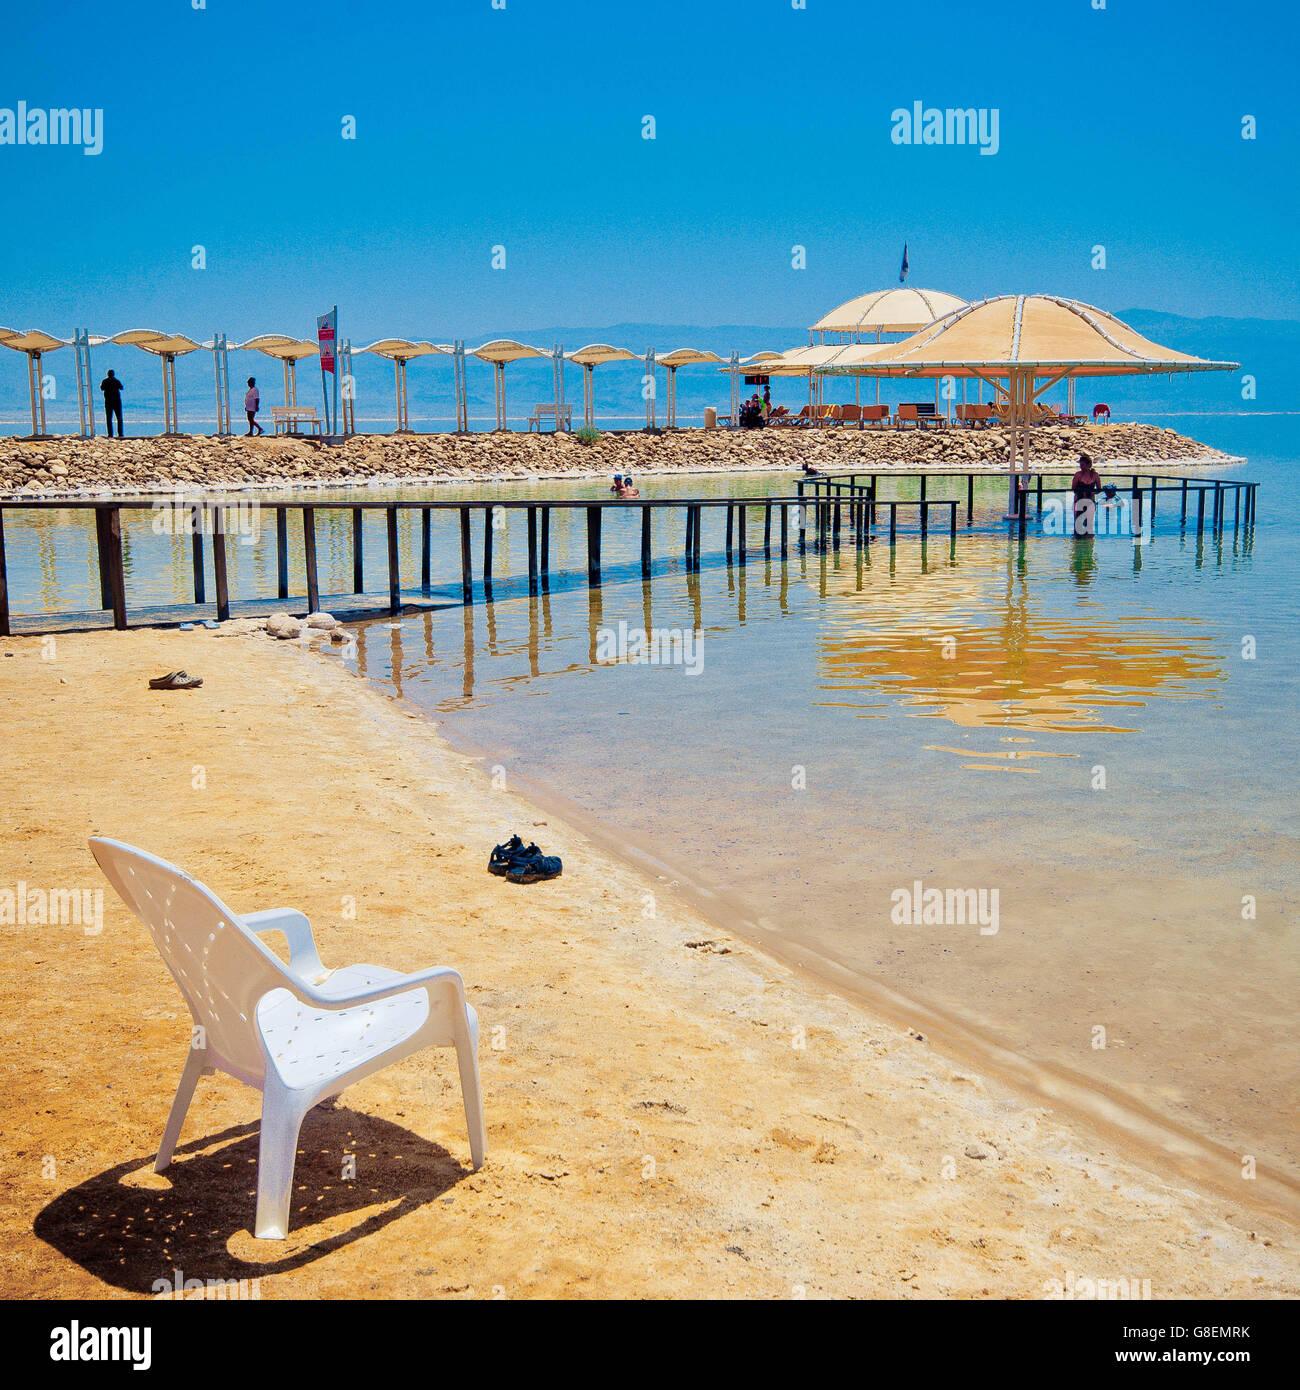 Der Stuhl am Ufer des Toten Meeres in Israel. Stockfoto